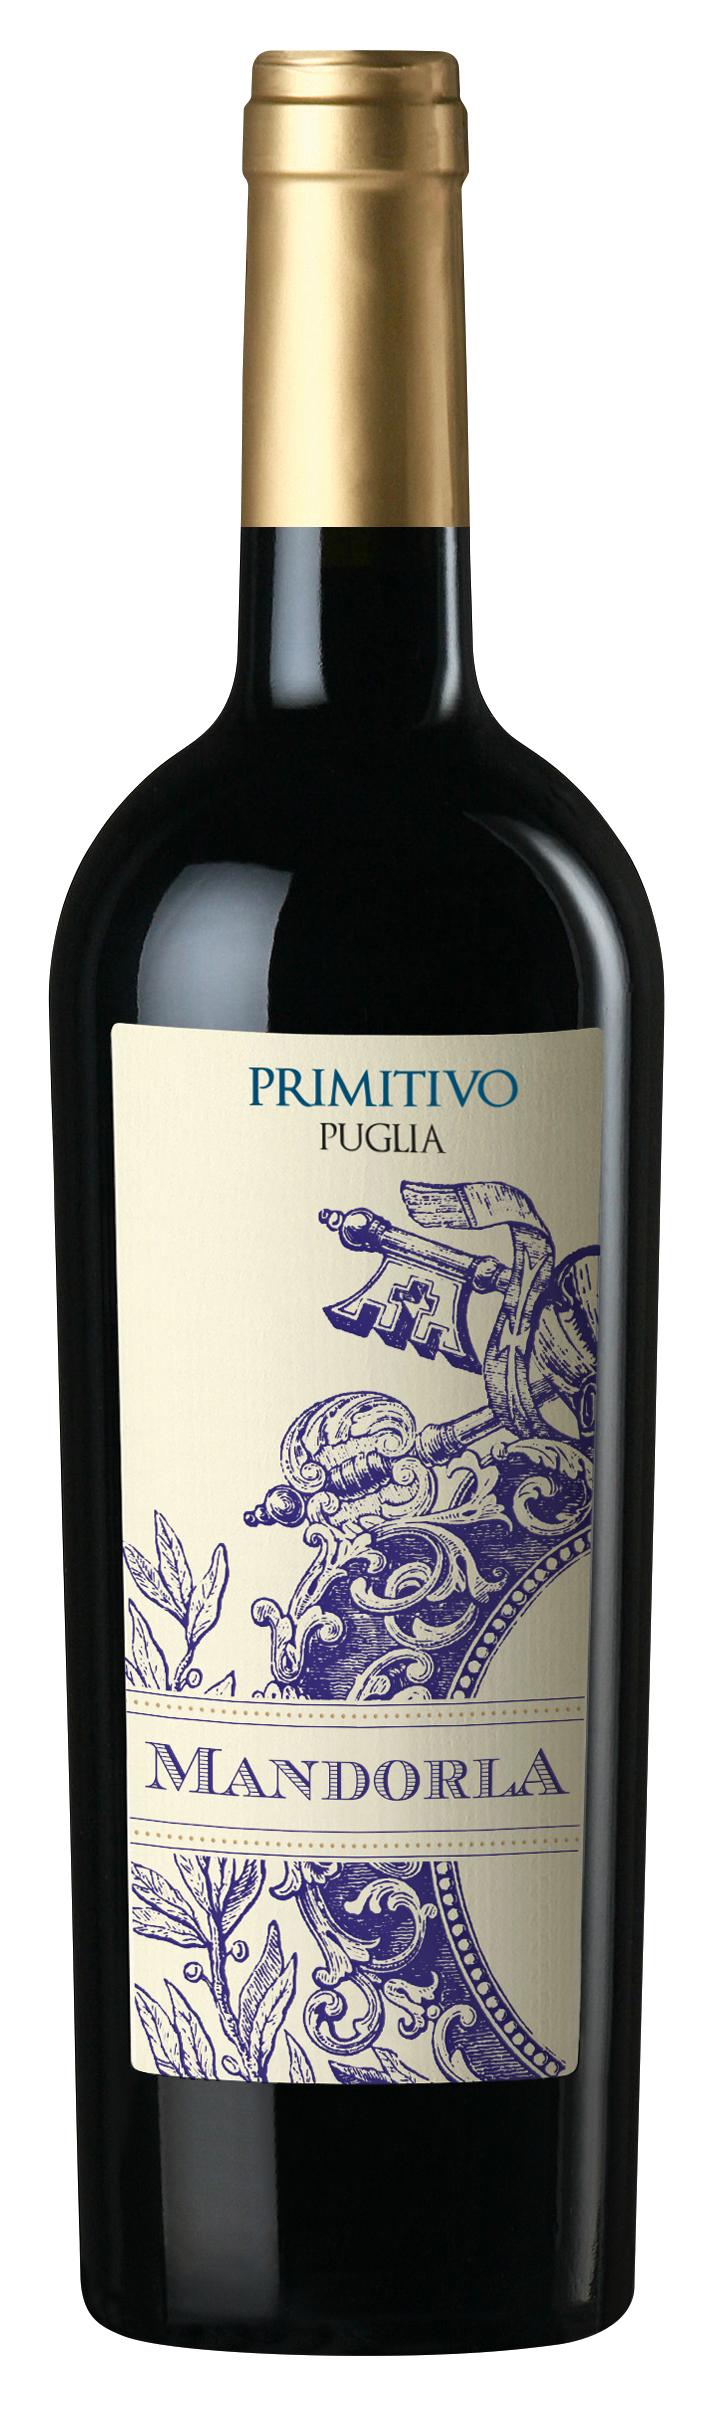 2019 Mandorla, Primitivo Puglia IGT